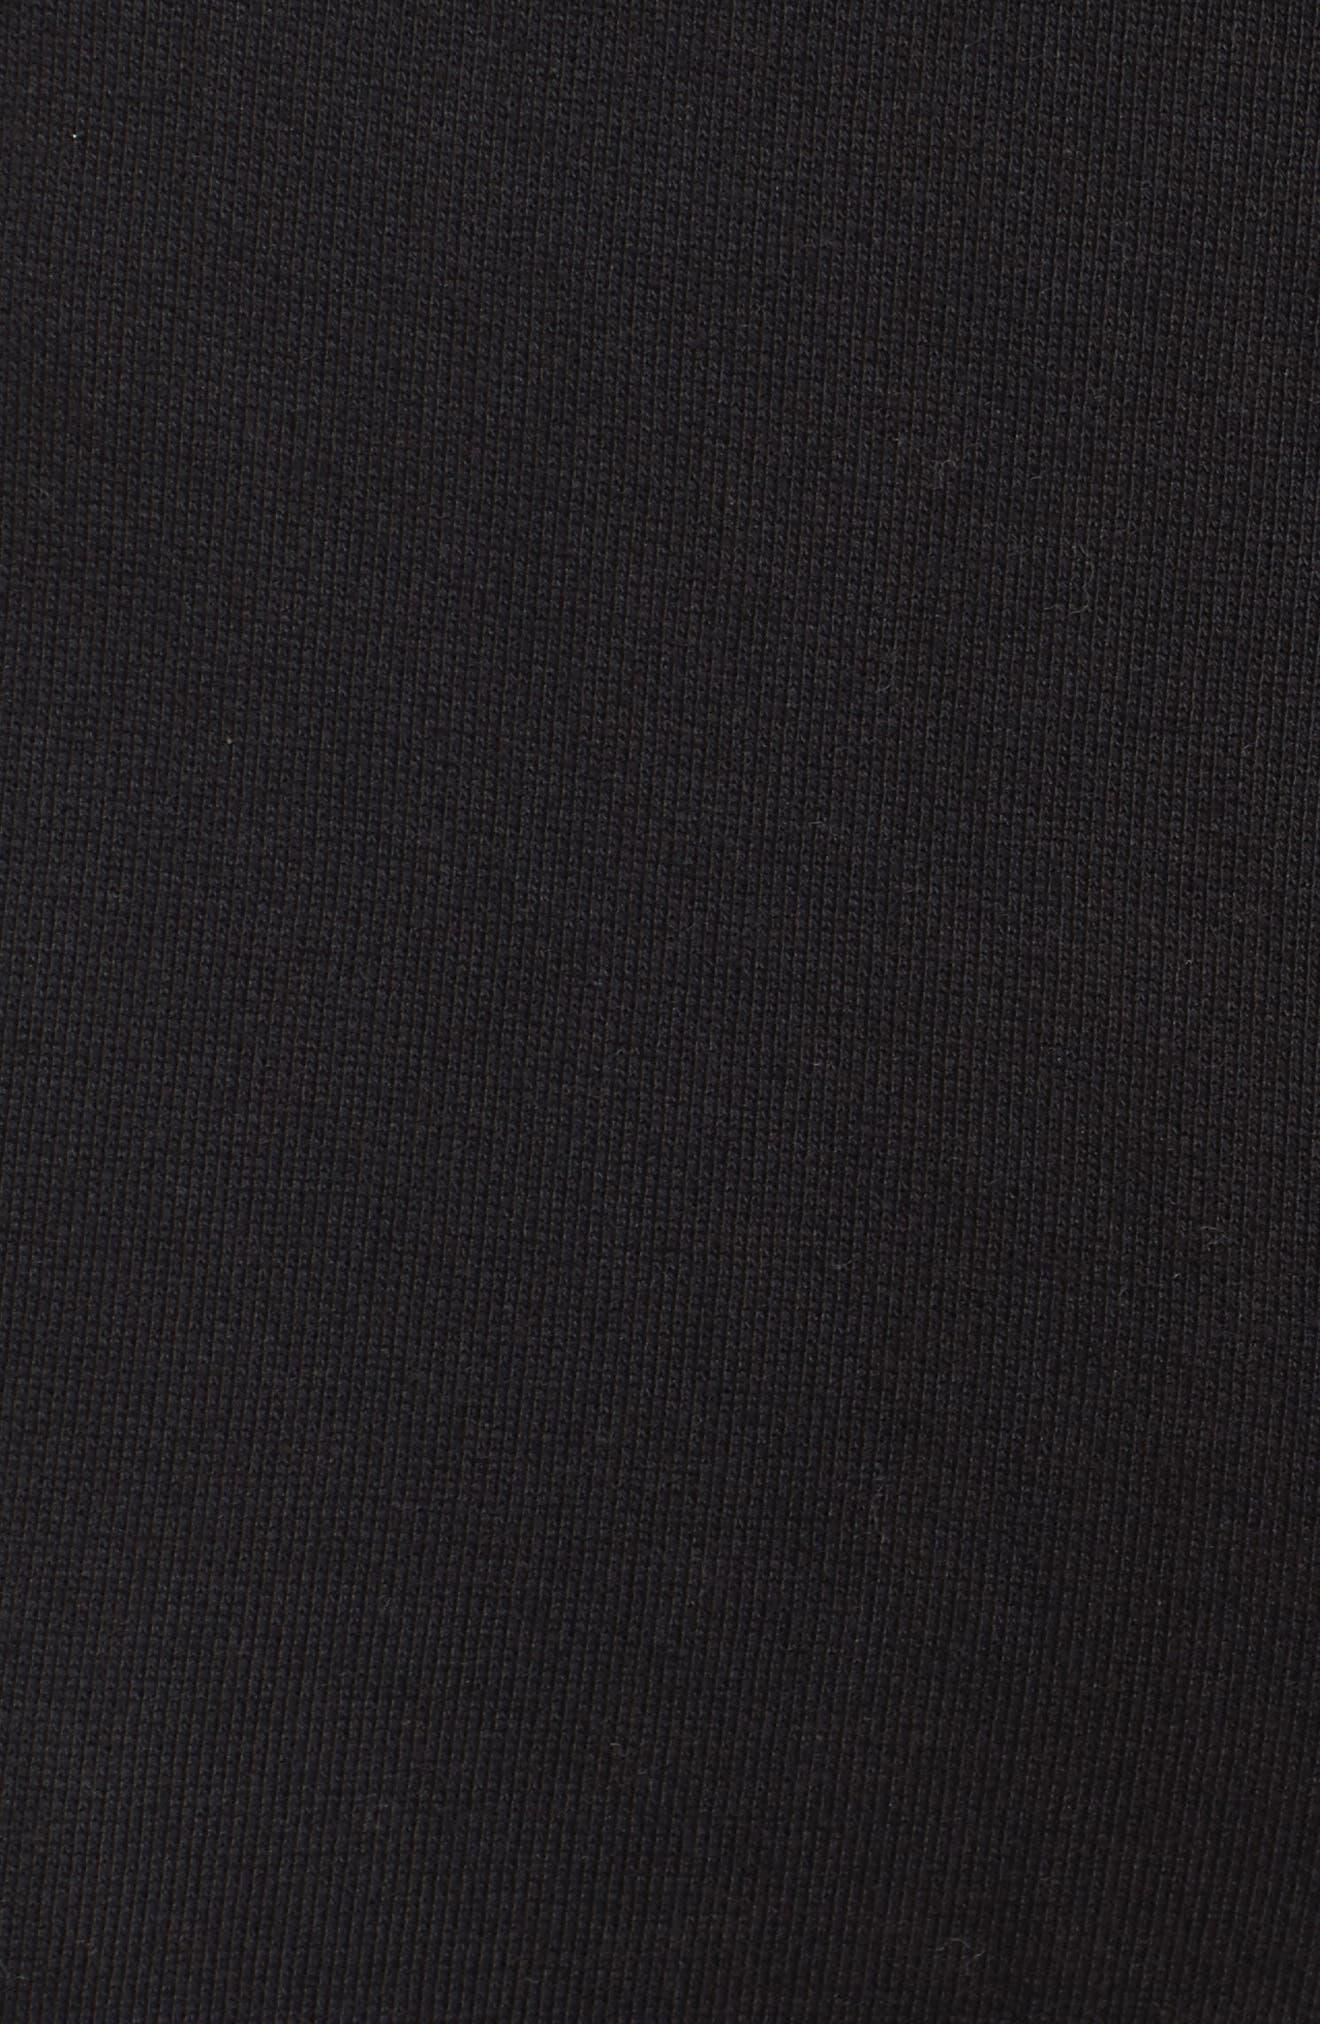 Lounge Sweatpants,                             Alternate thumbnail 9, color,